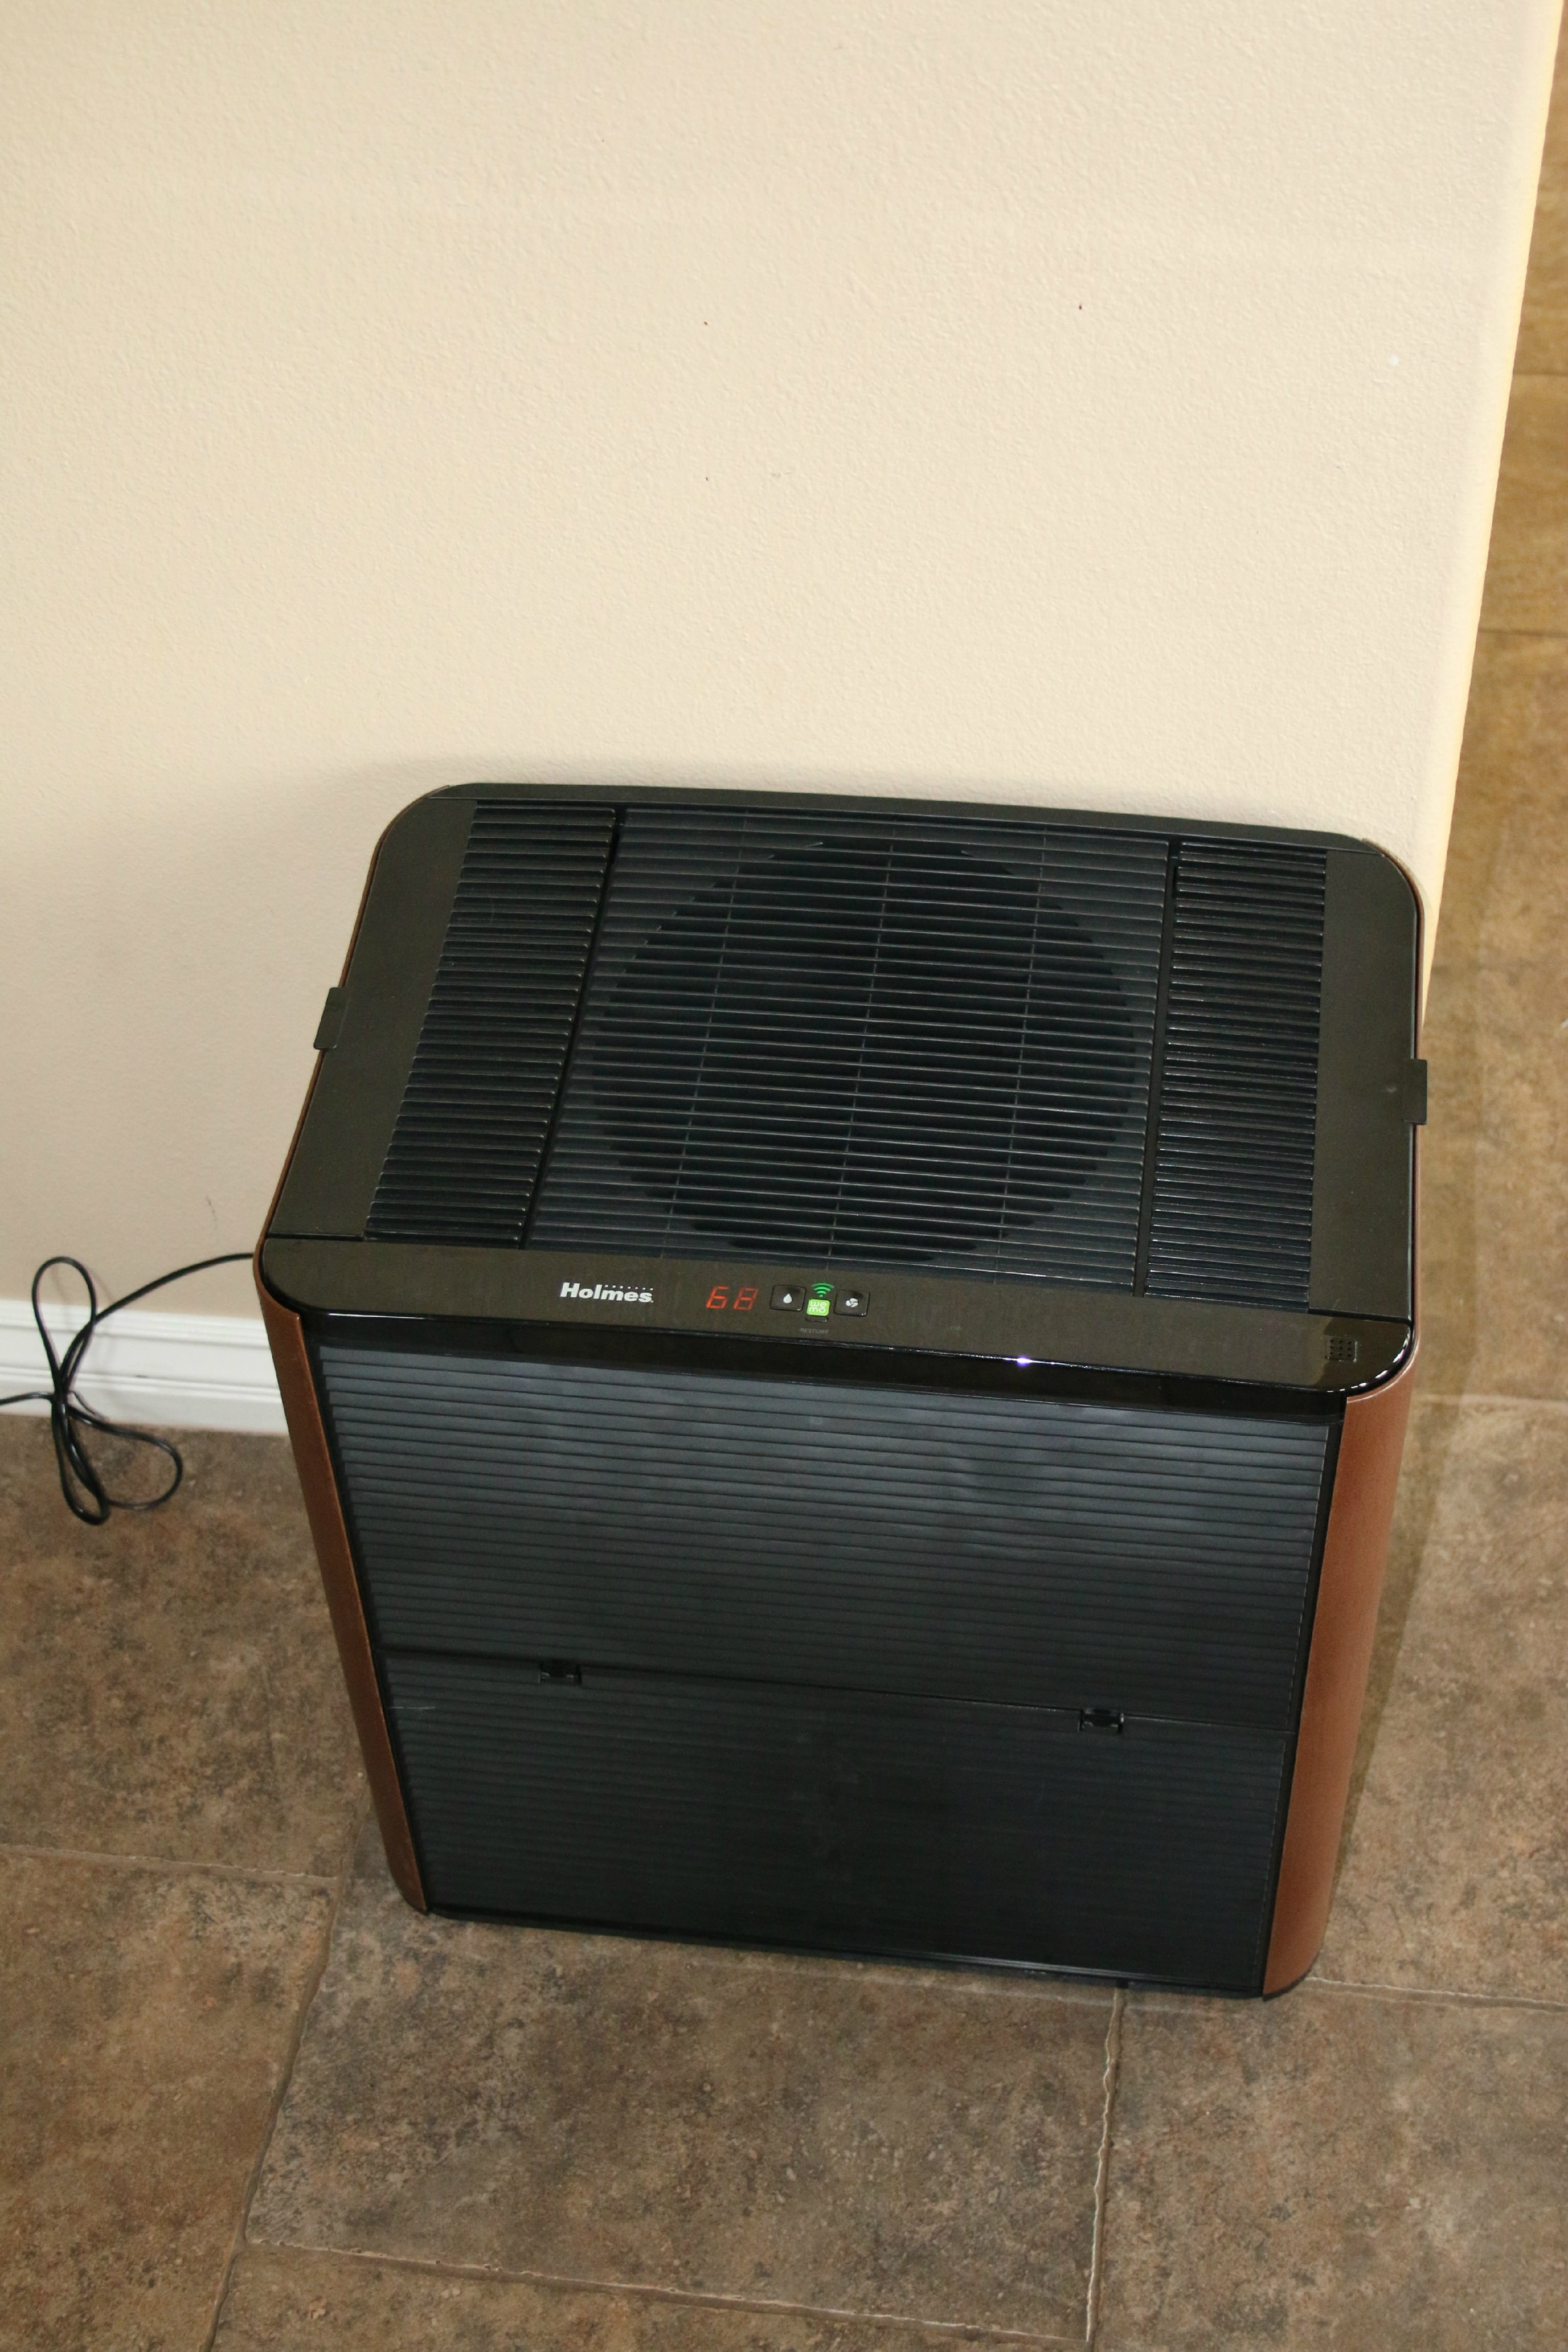 holmes whole house humidifier